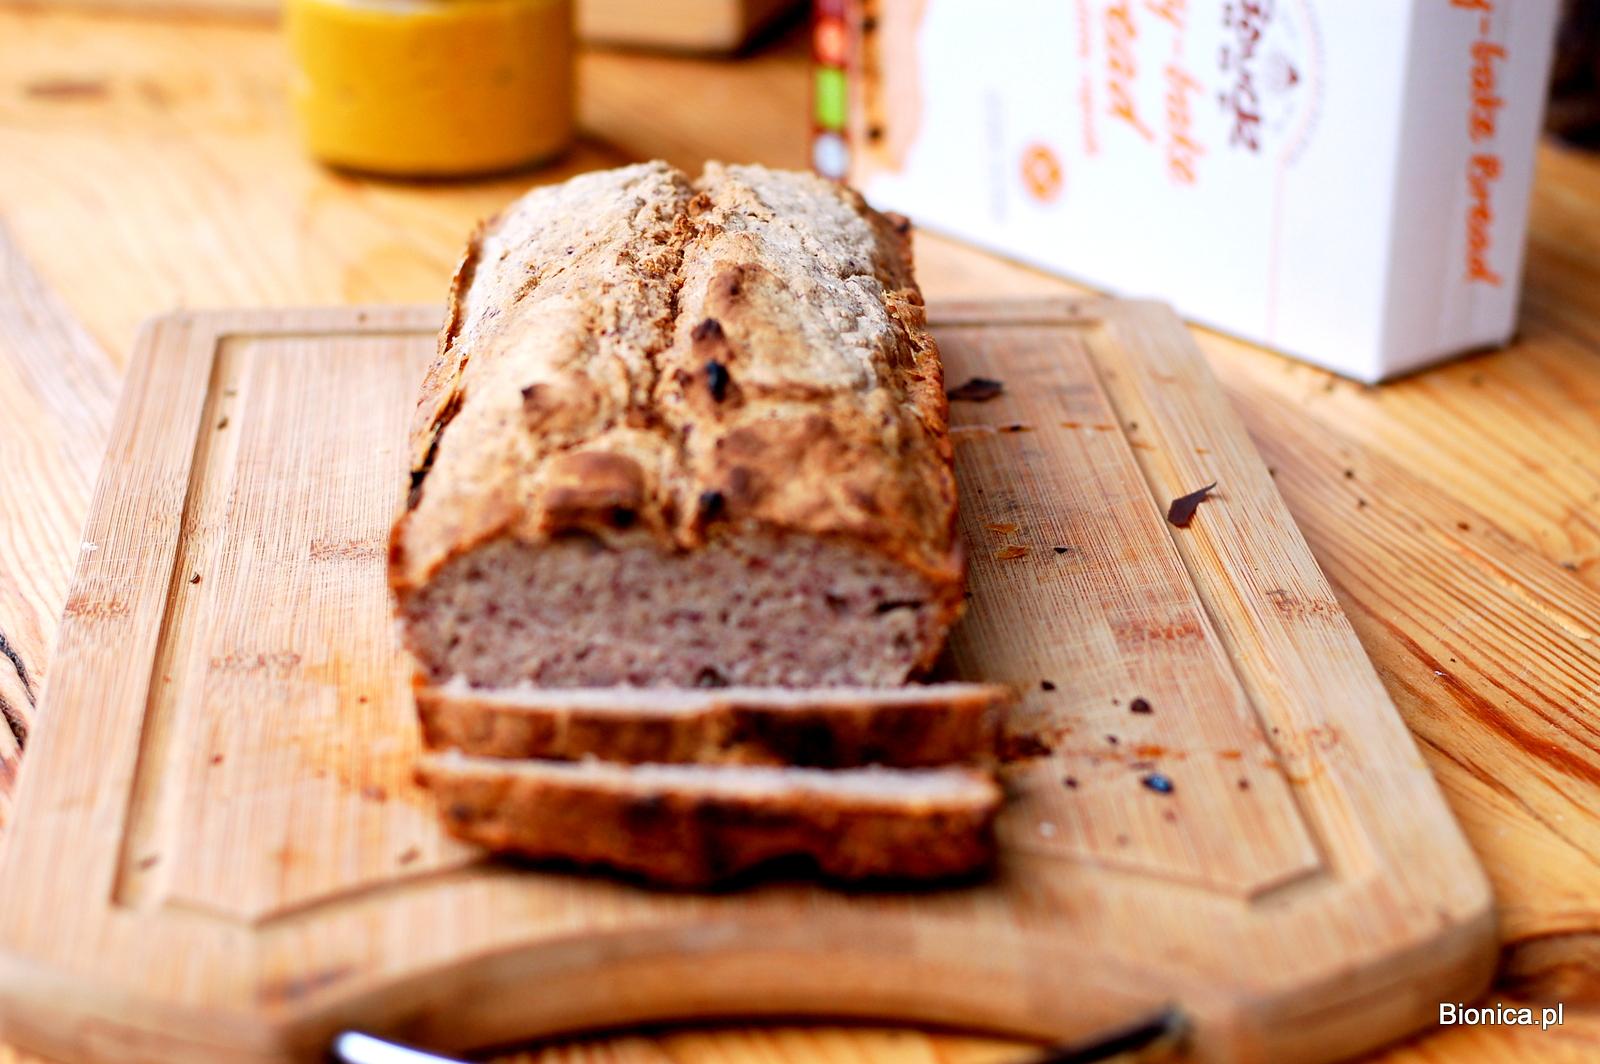 freshly baked Bauckhof bread www.bionica.pl